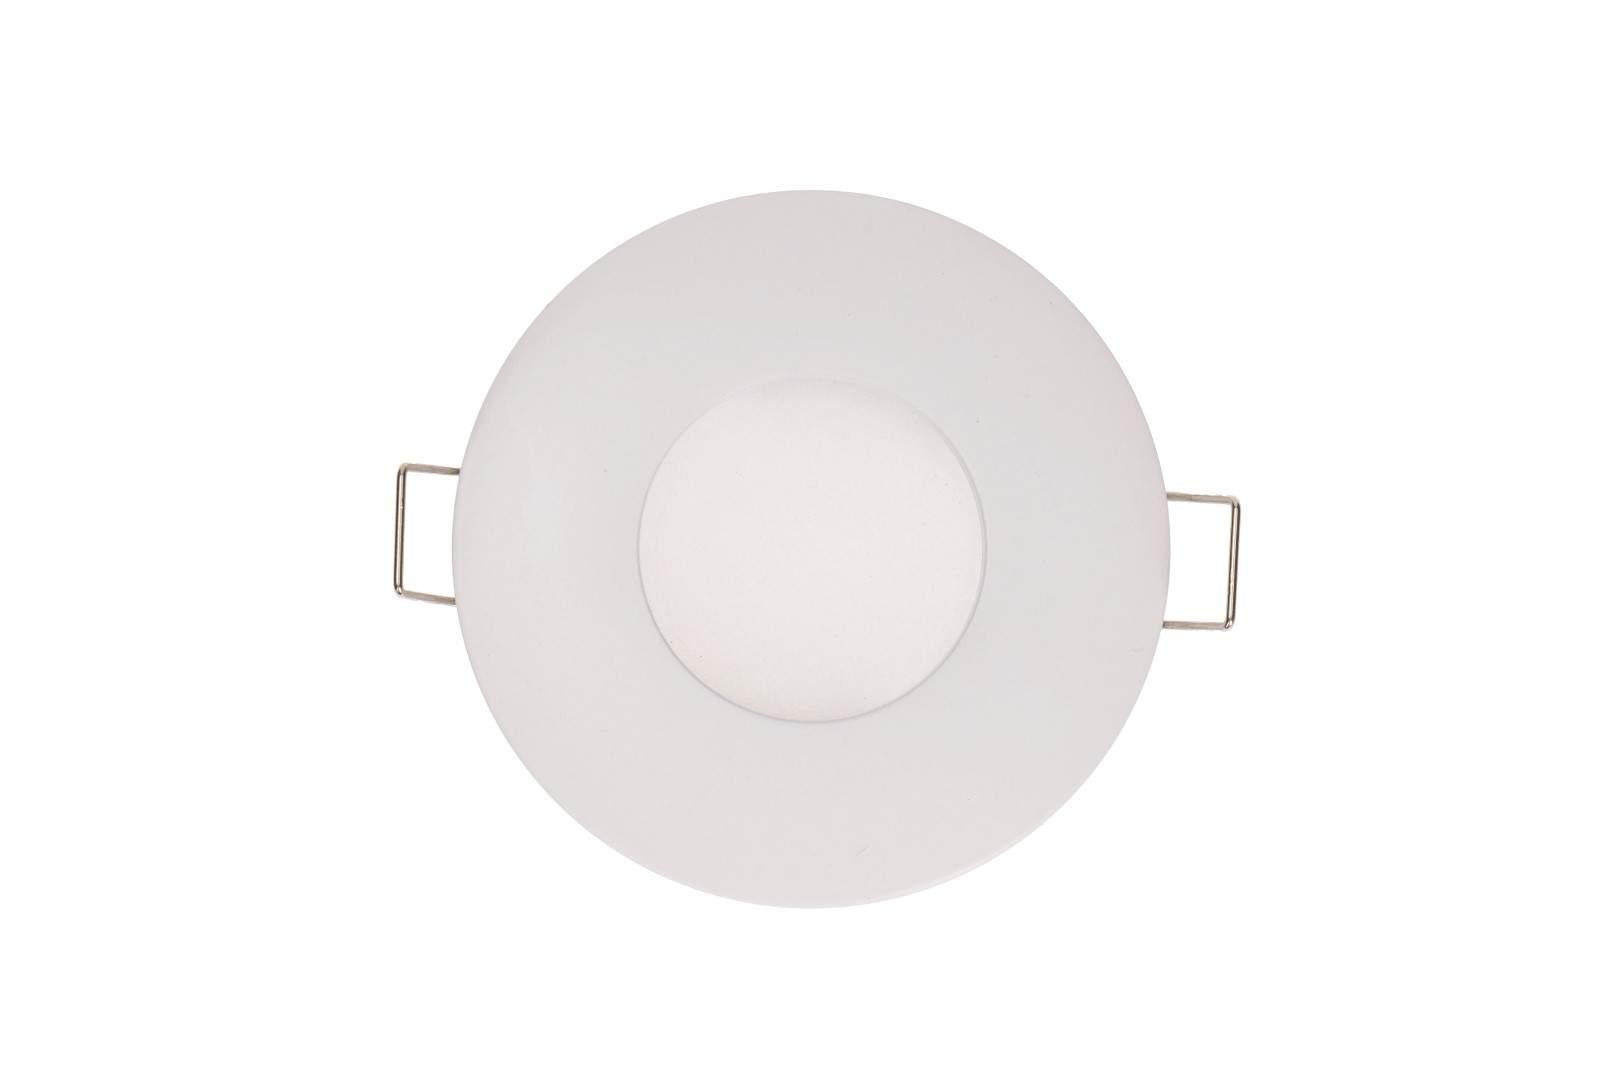 Luminaire frame Luminaire frame BCL-01 white round IP44